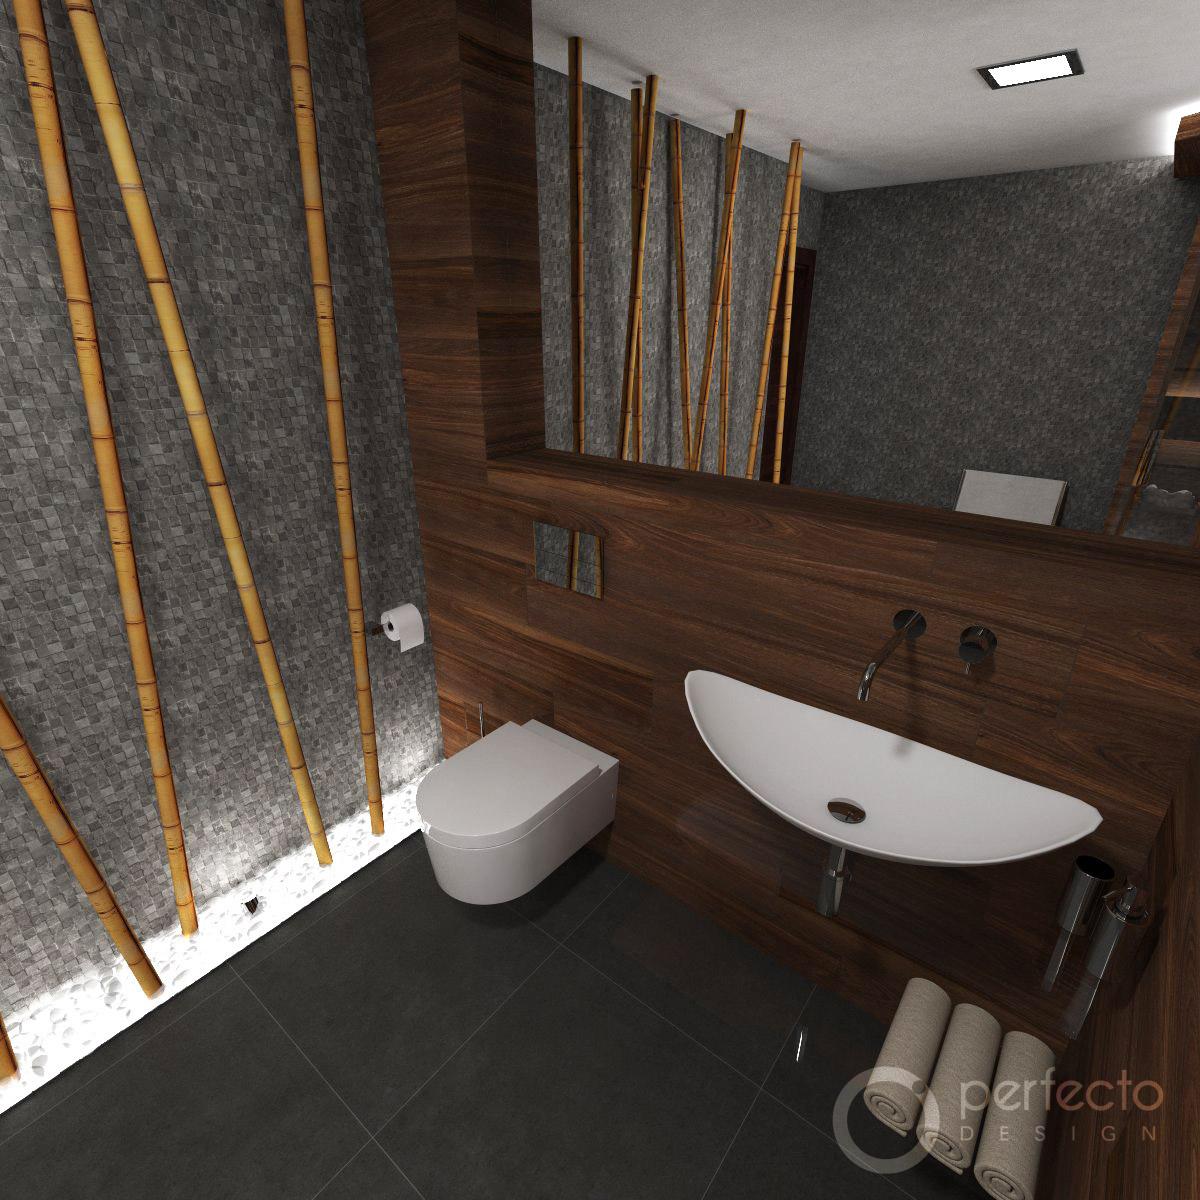 design#5001992: das moderne badezimmer wellness design ? das ... - Das Moderne Badezimmer Wellness Design